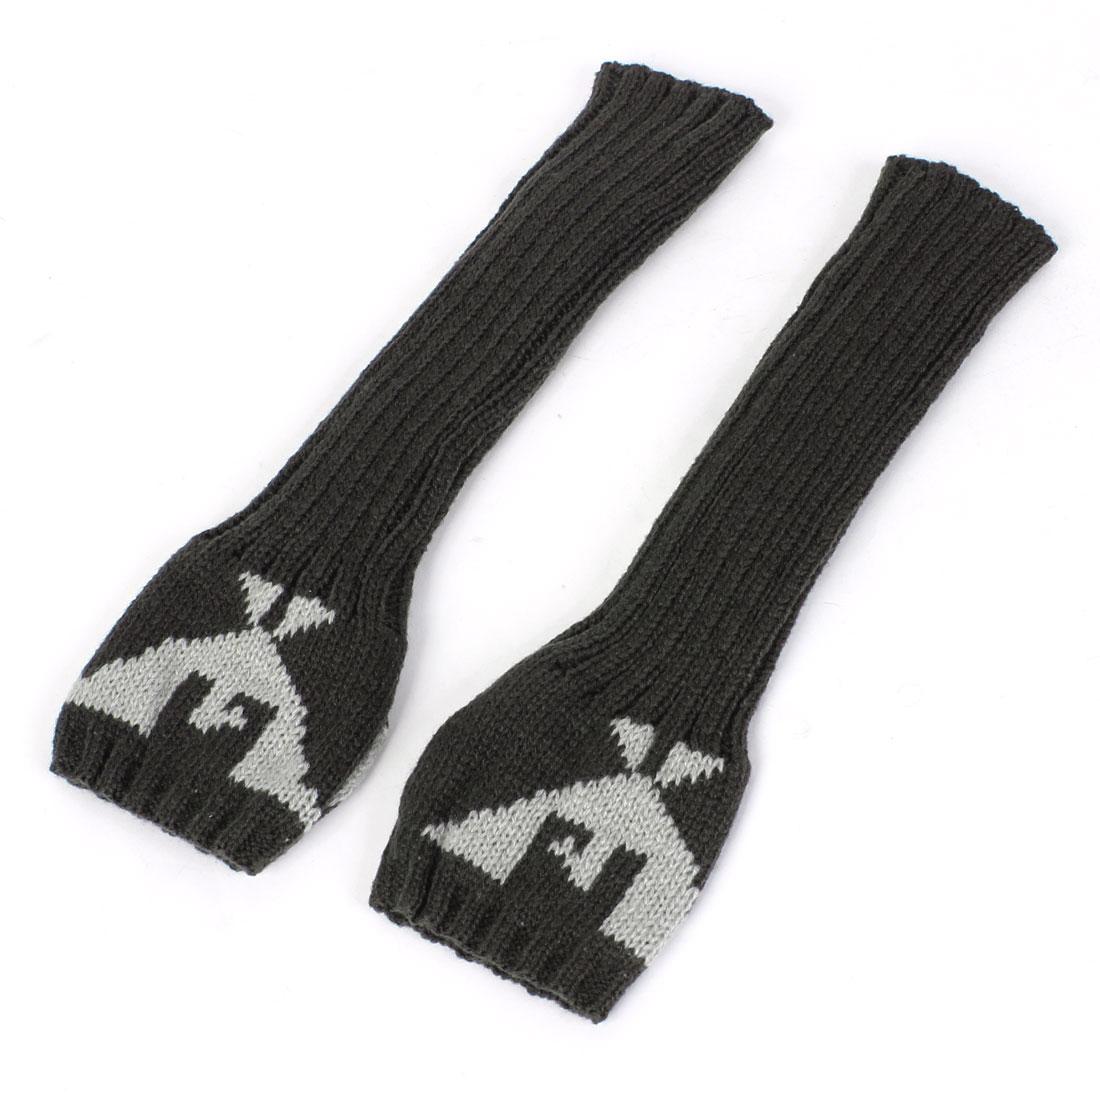 Ladies Eagle Pattern Elbow Length Knitted Long Fingerless Gloves Dark Gray Pair